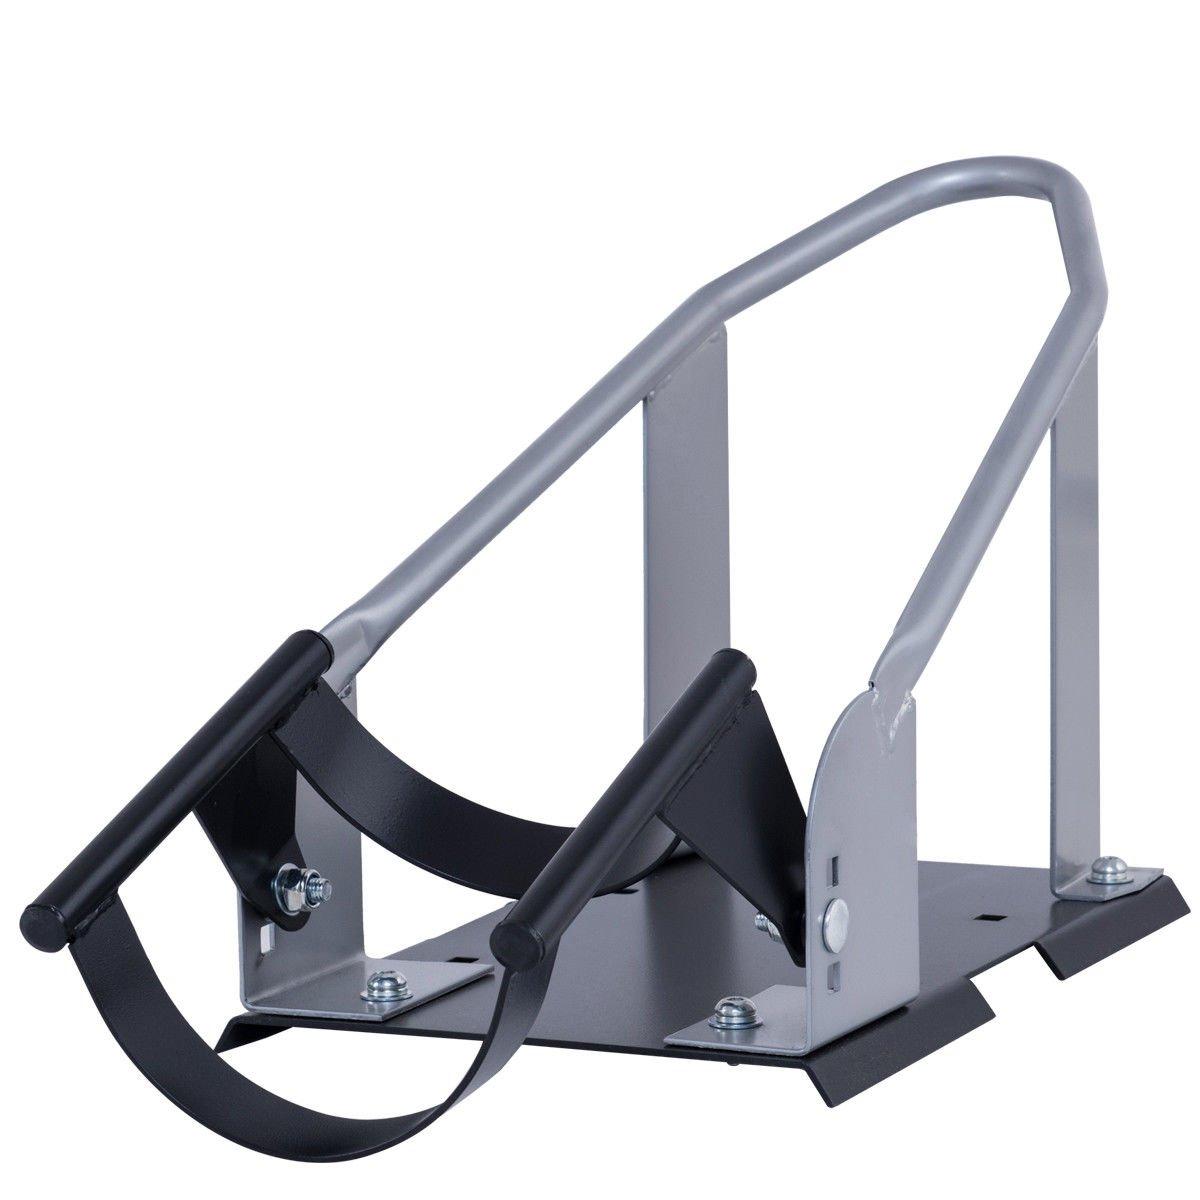 Goplus Motorcycle Wheel Chock Cradle Scooter Bike Stand Lift Mount Trailer (Silver) by Goplus